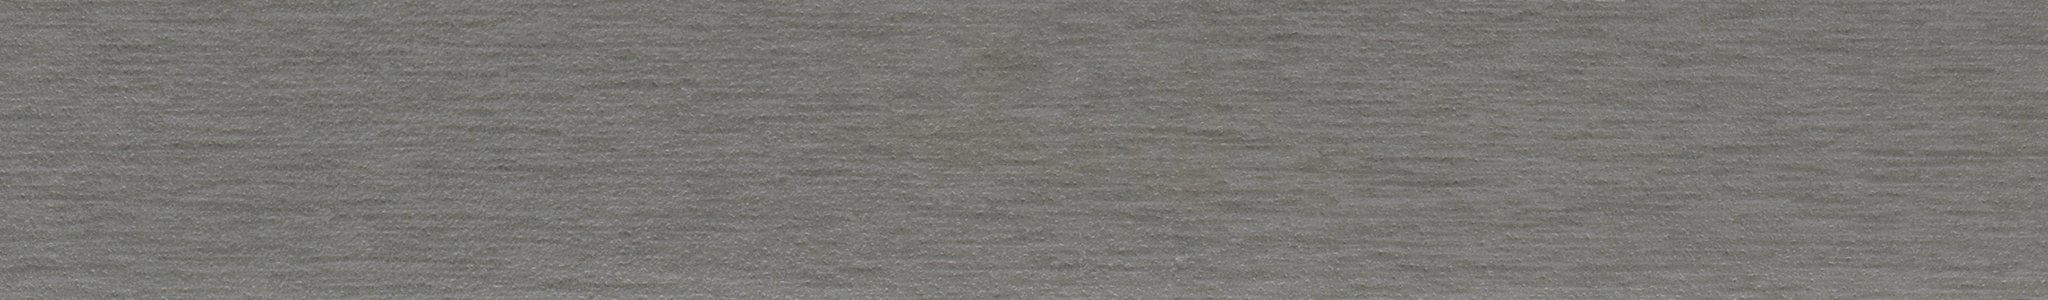 HD 298315 ABS Kante Dekor Dunkel Life perl